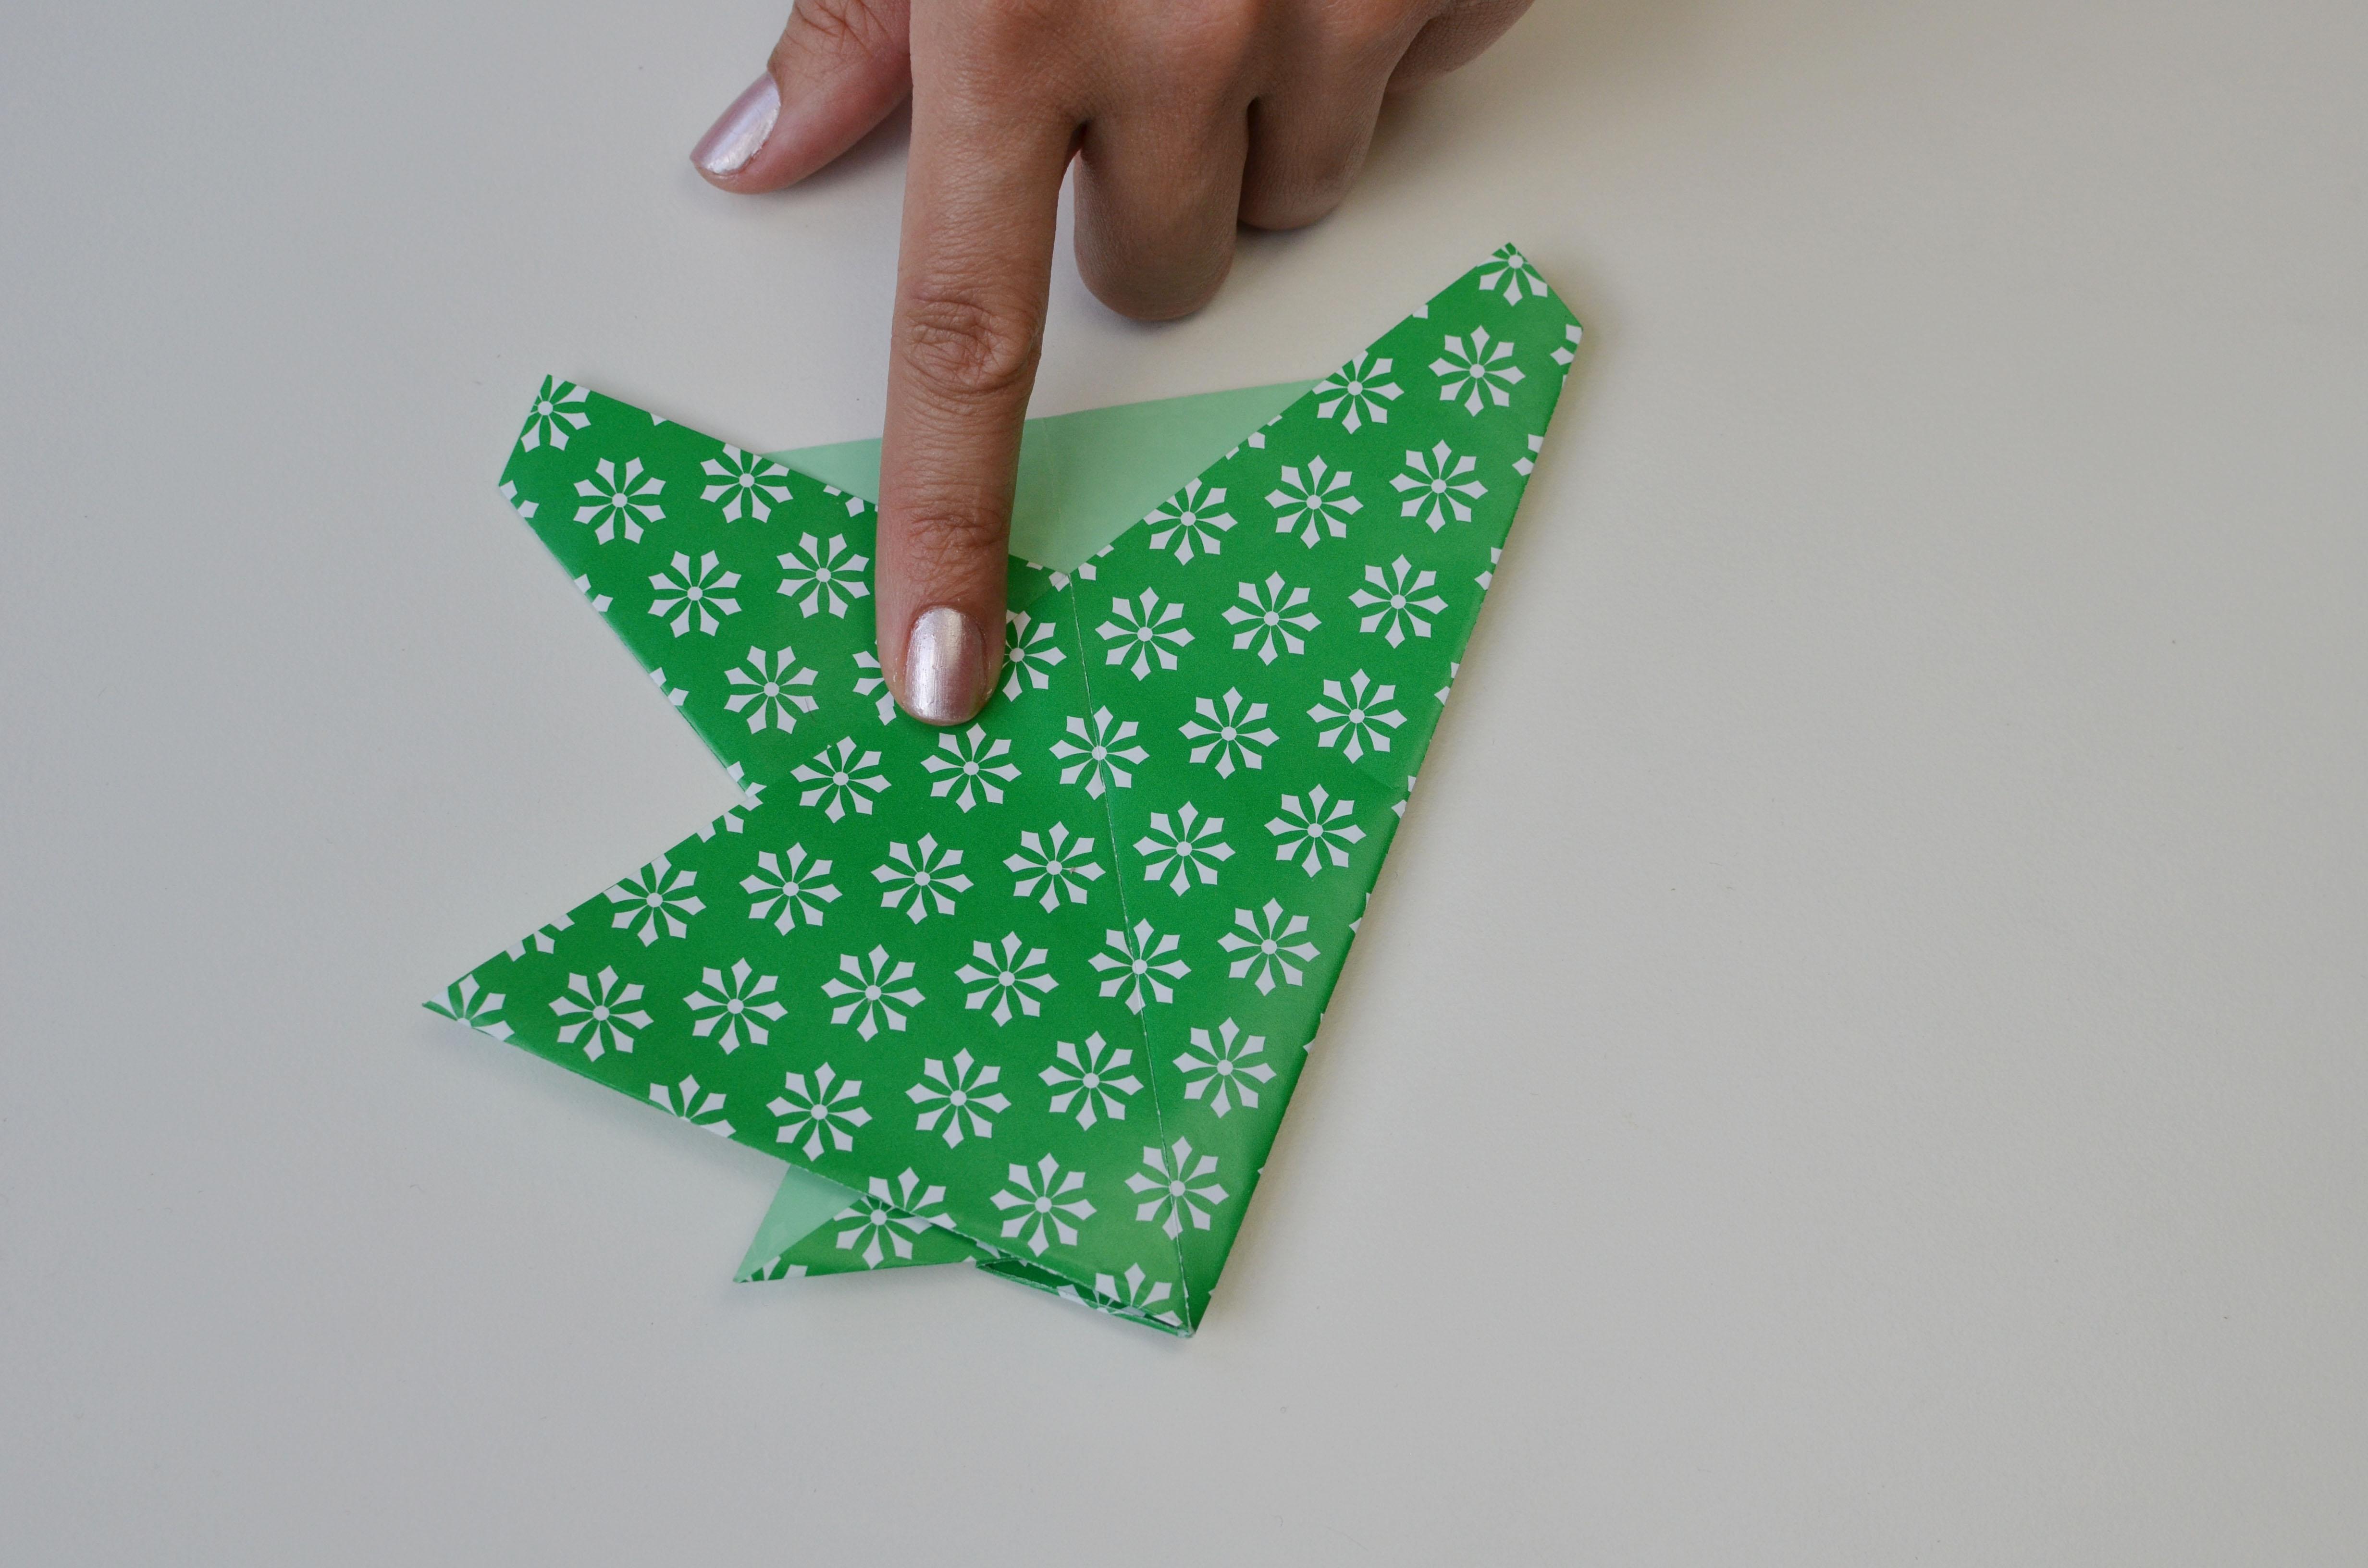 braincrafts_frog_origami_pt23.jpg